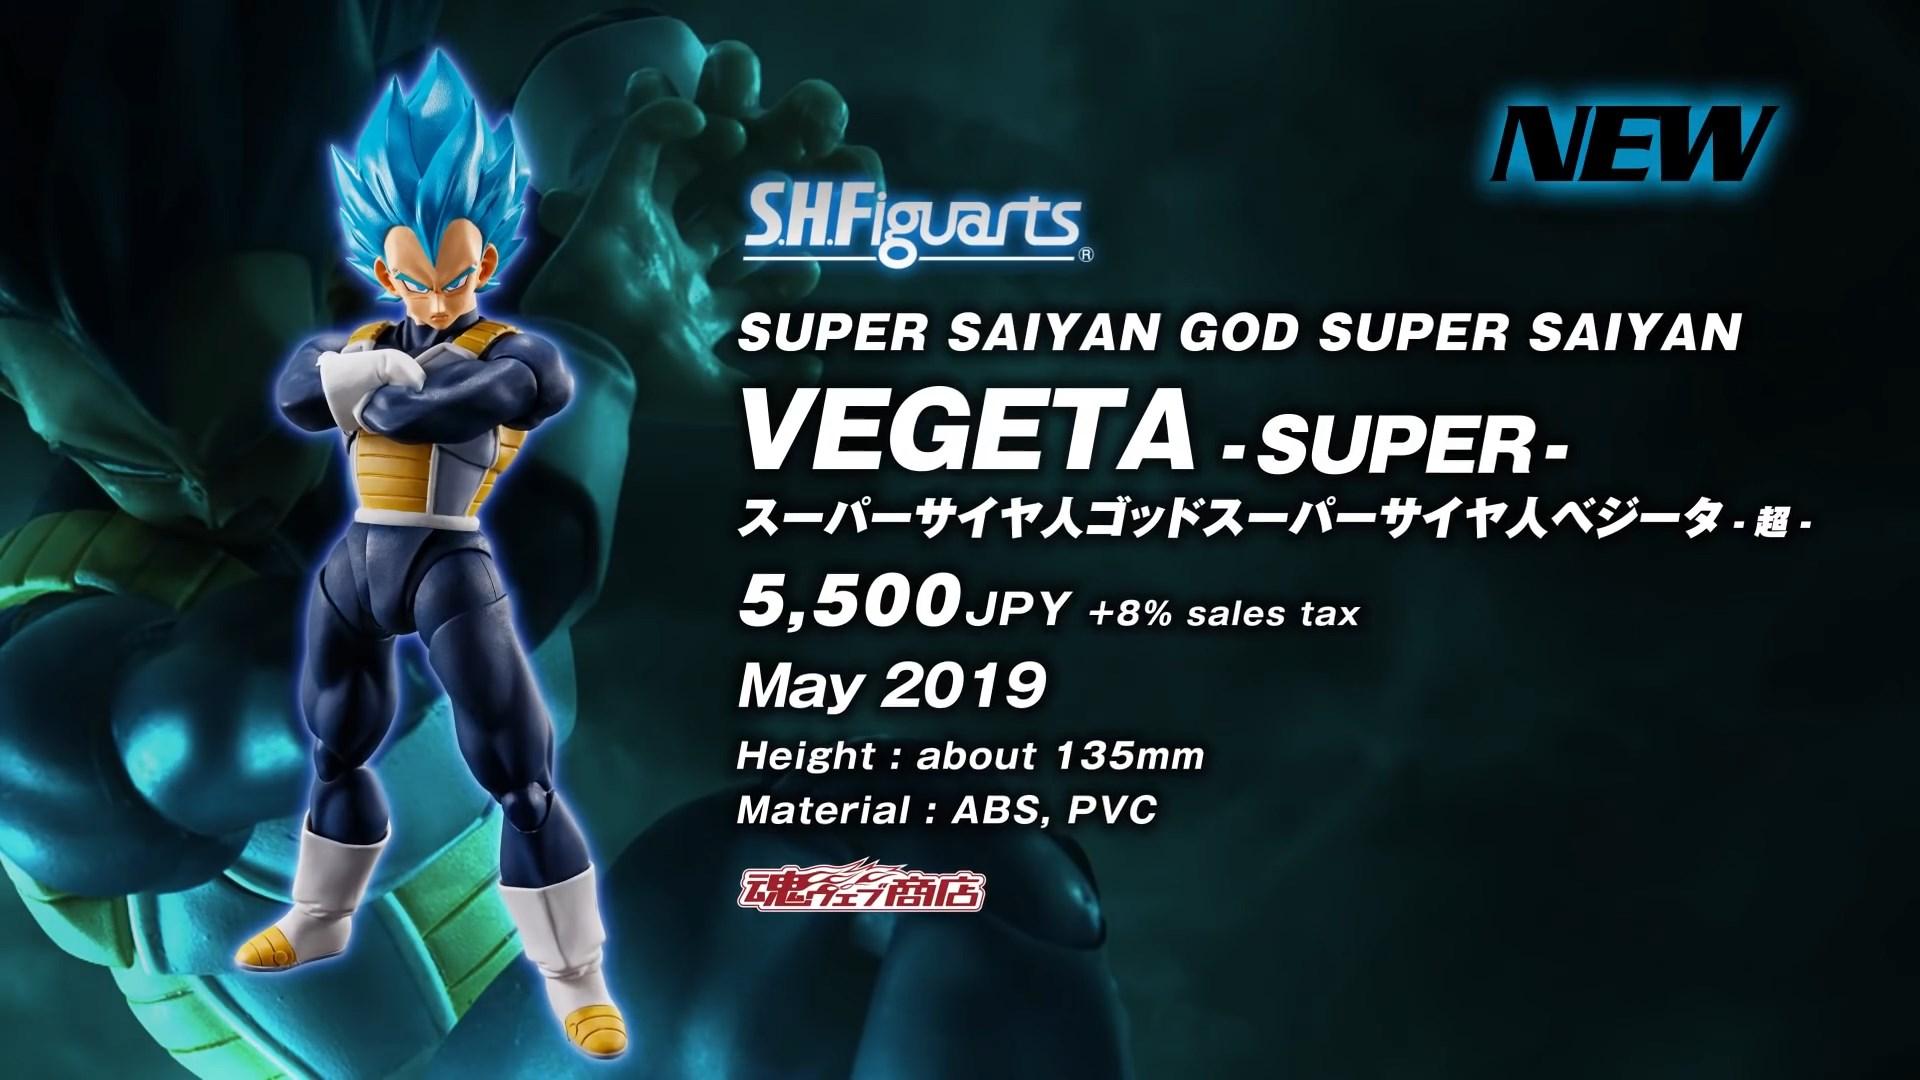 S.H.Figuarts Vegeta Super Saiyan Blue